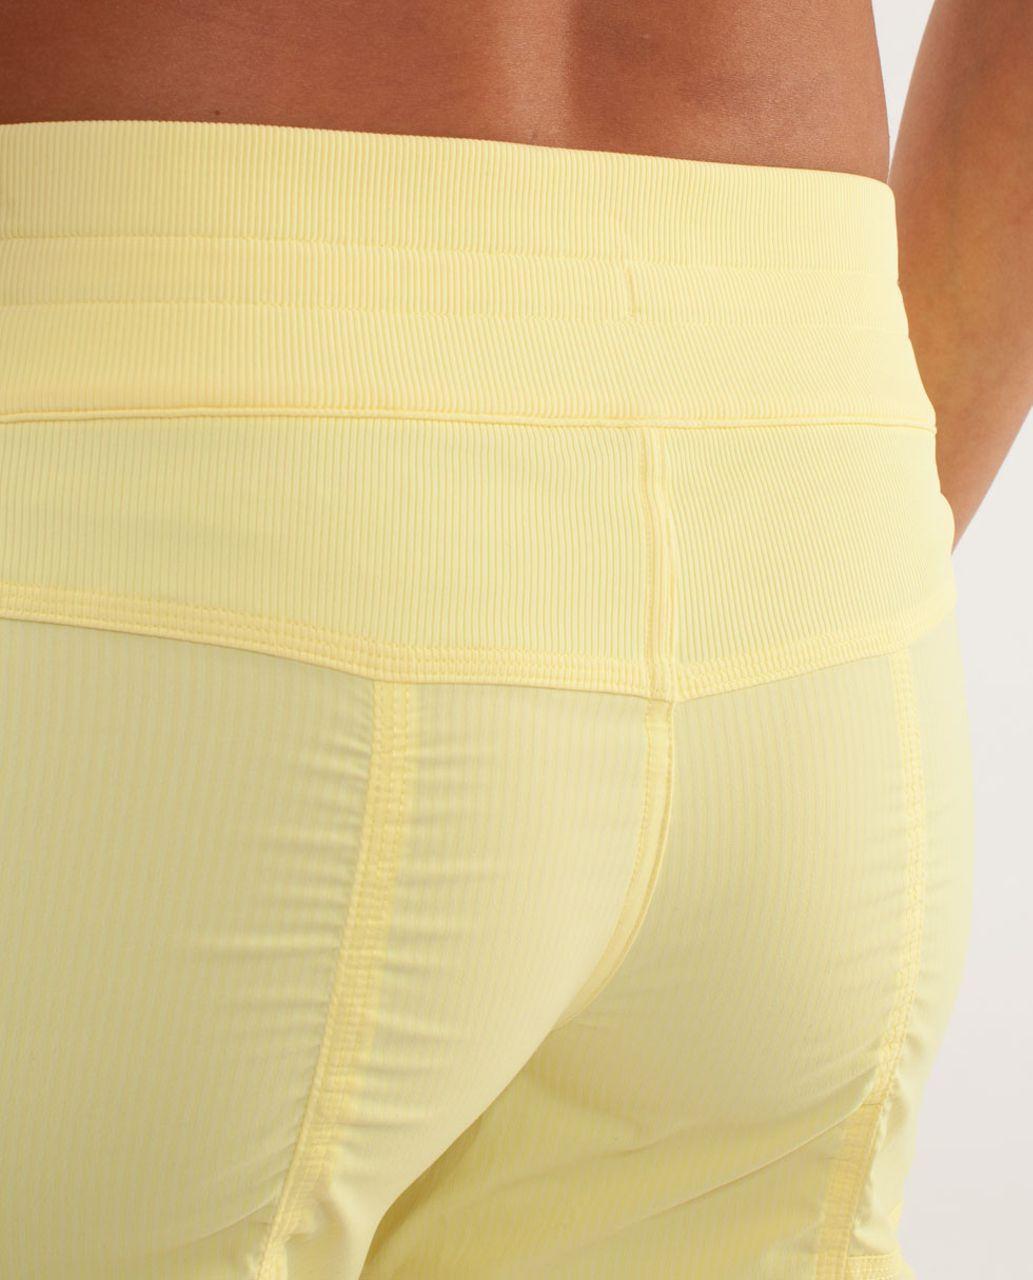 Lululemon Studio Pant II *No Liner - Mellow Lemon